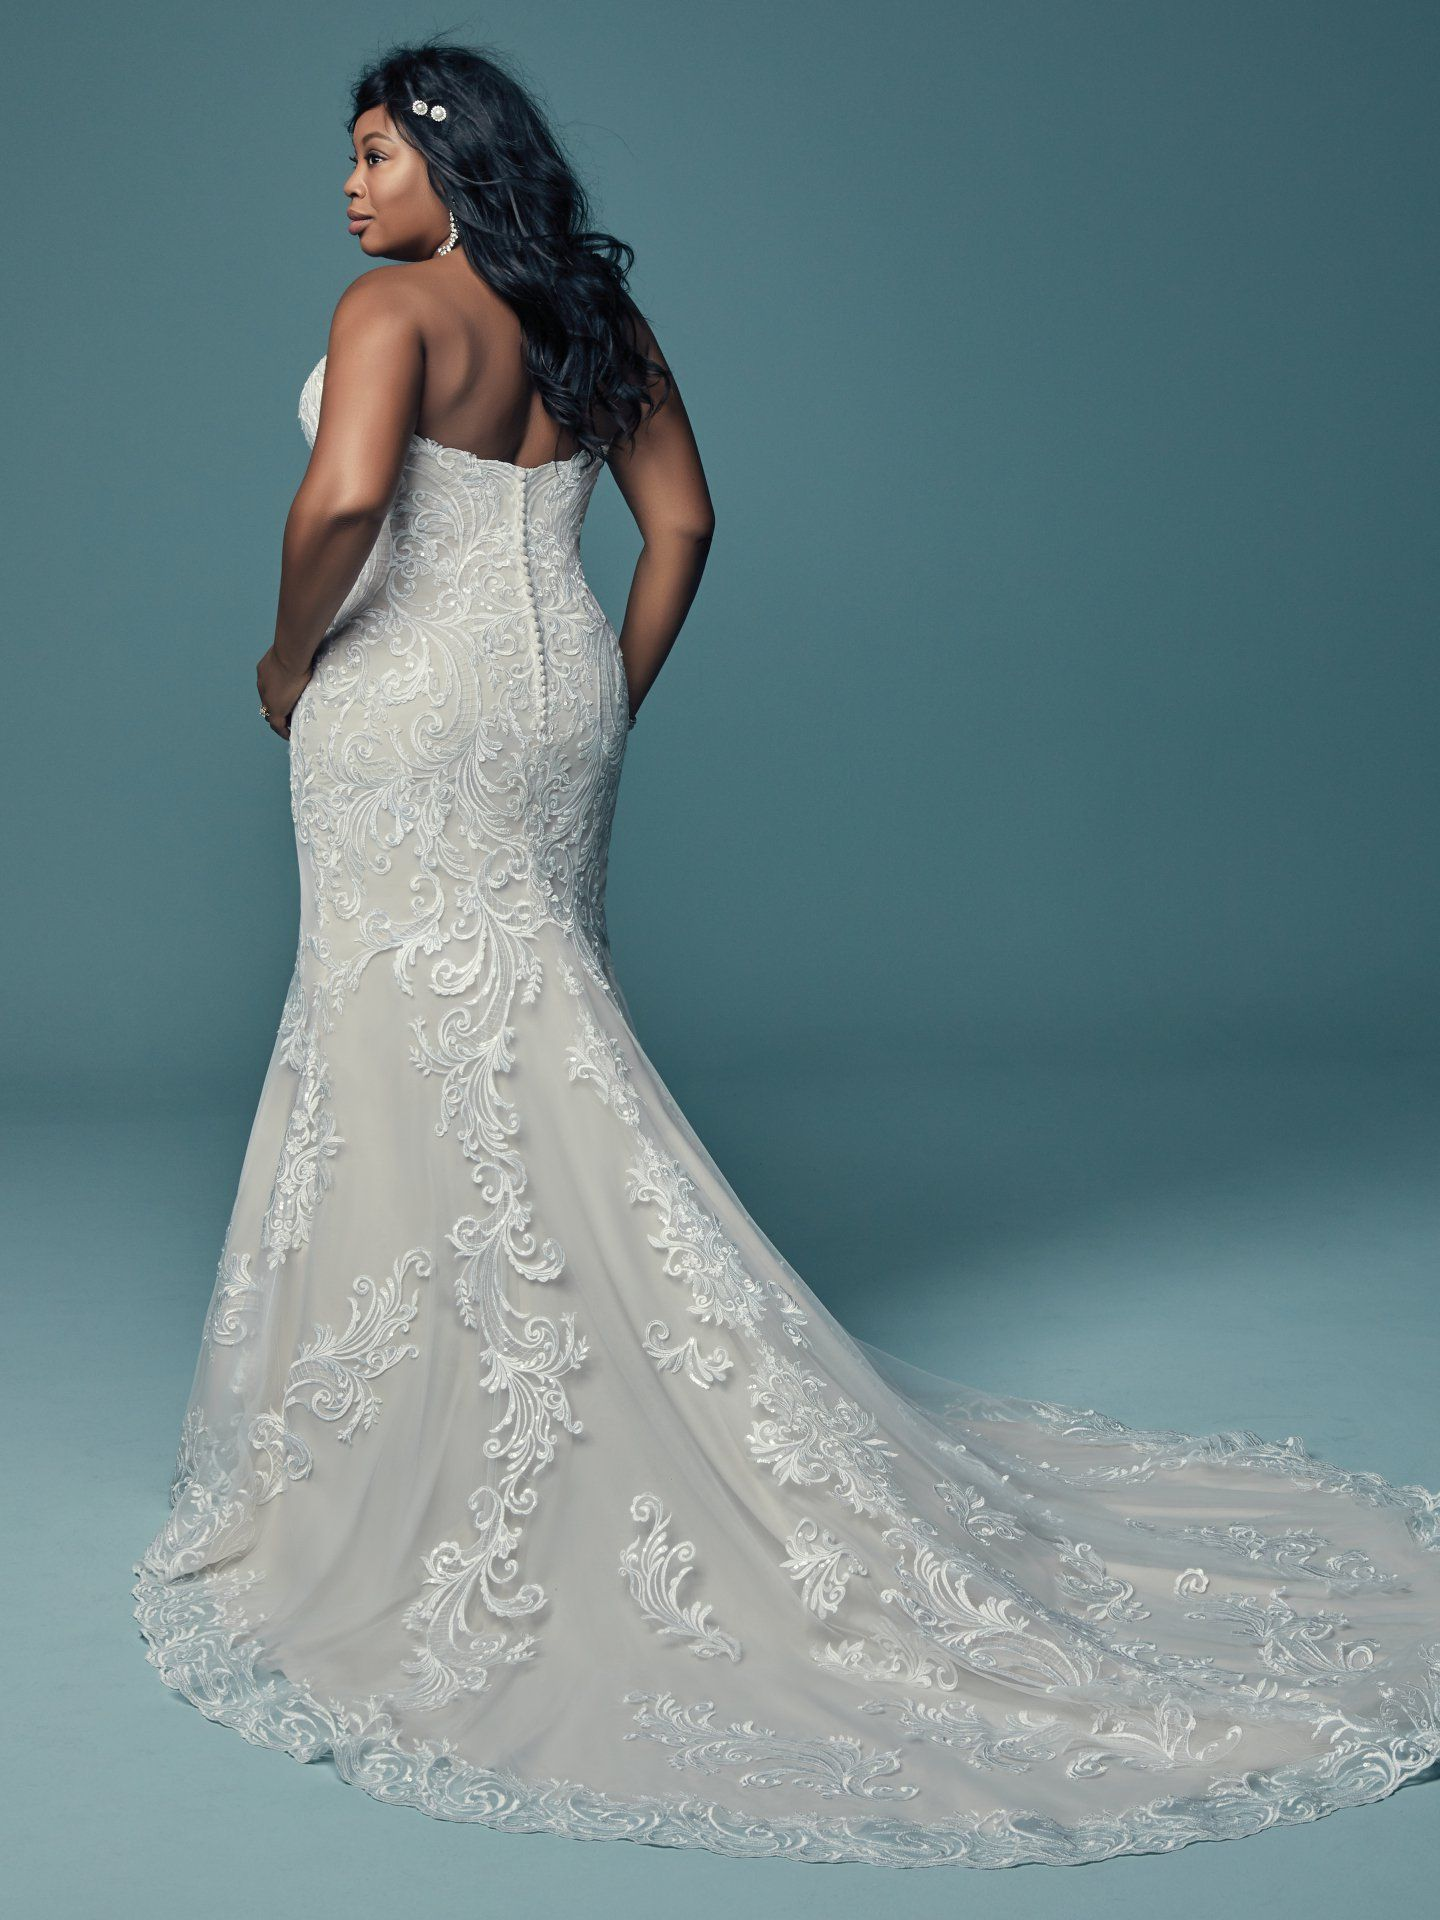 Blue plus size wedding dresses  LUANNE by Maggie Sottero Wedding Dresses  Plus Size Wedding Dresses